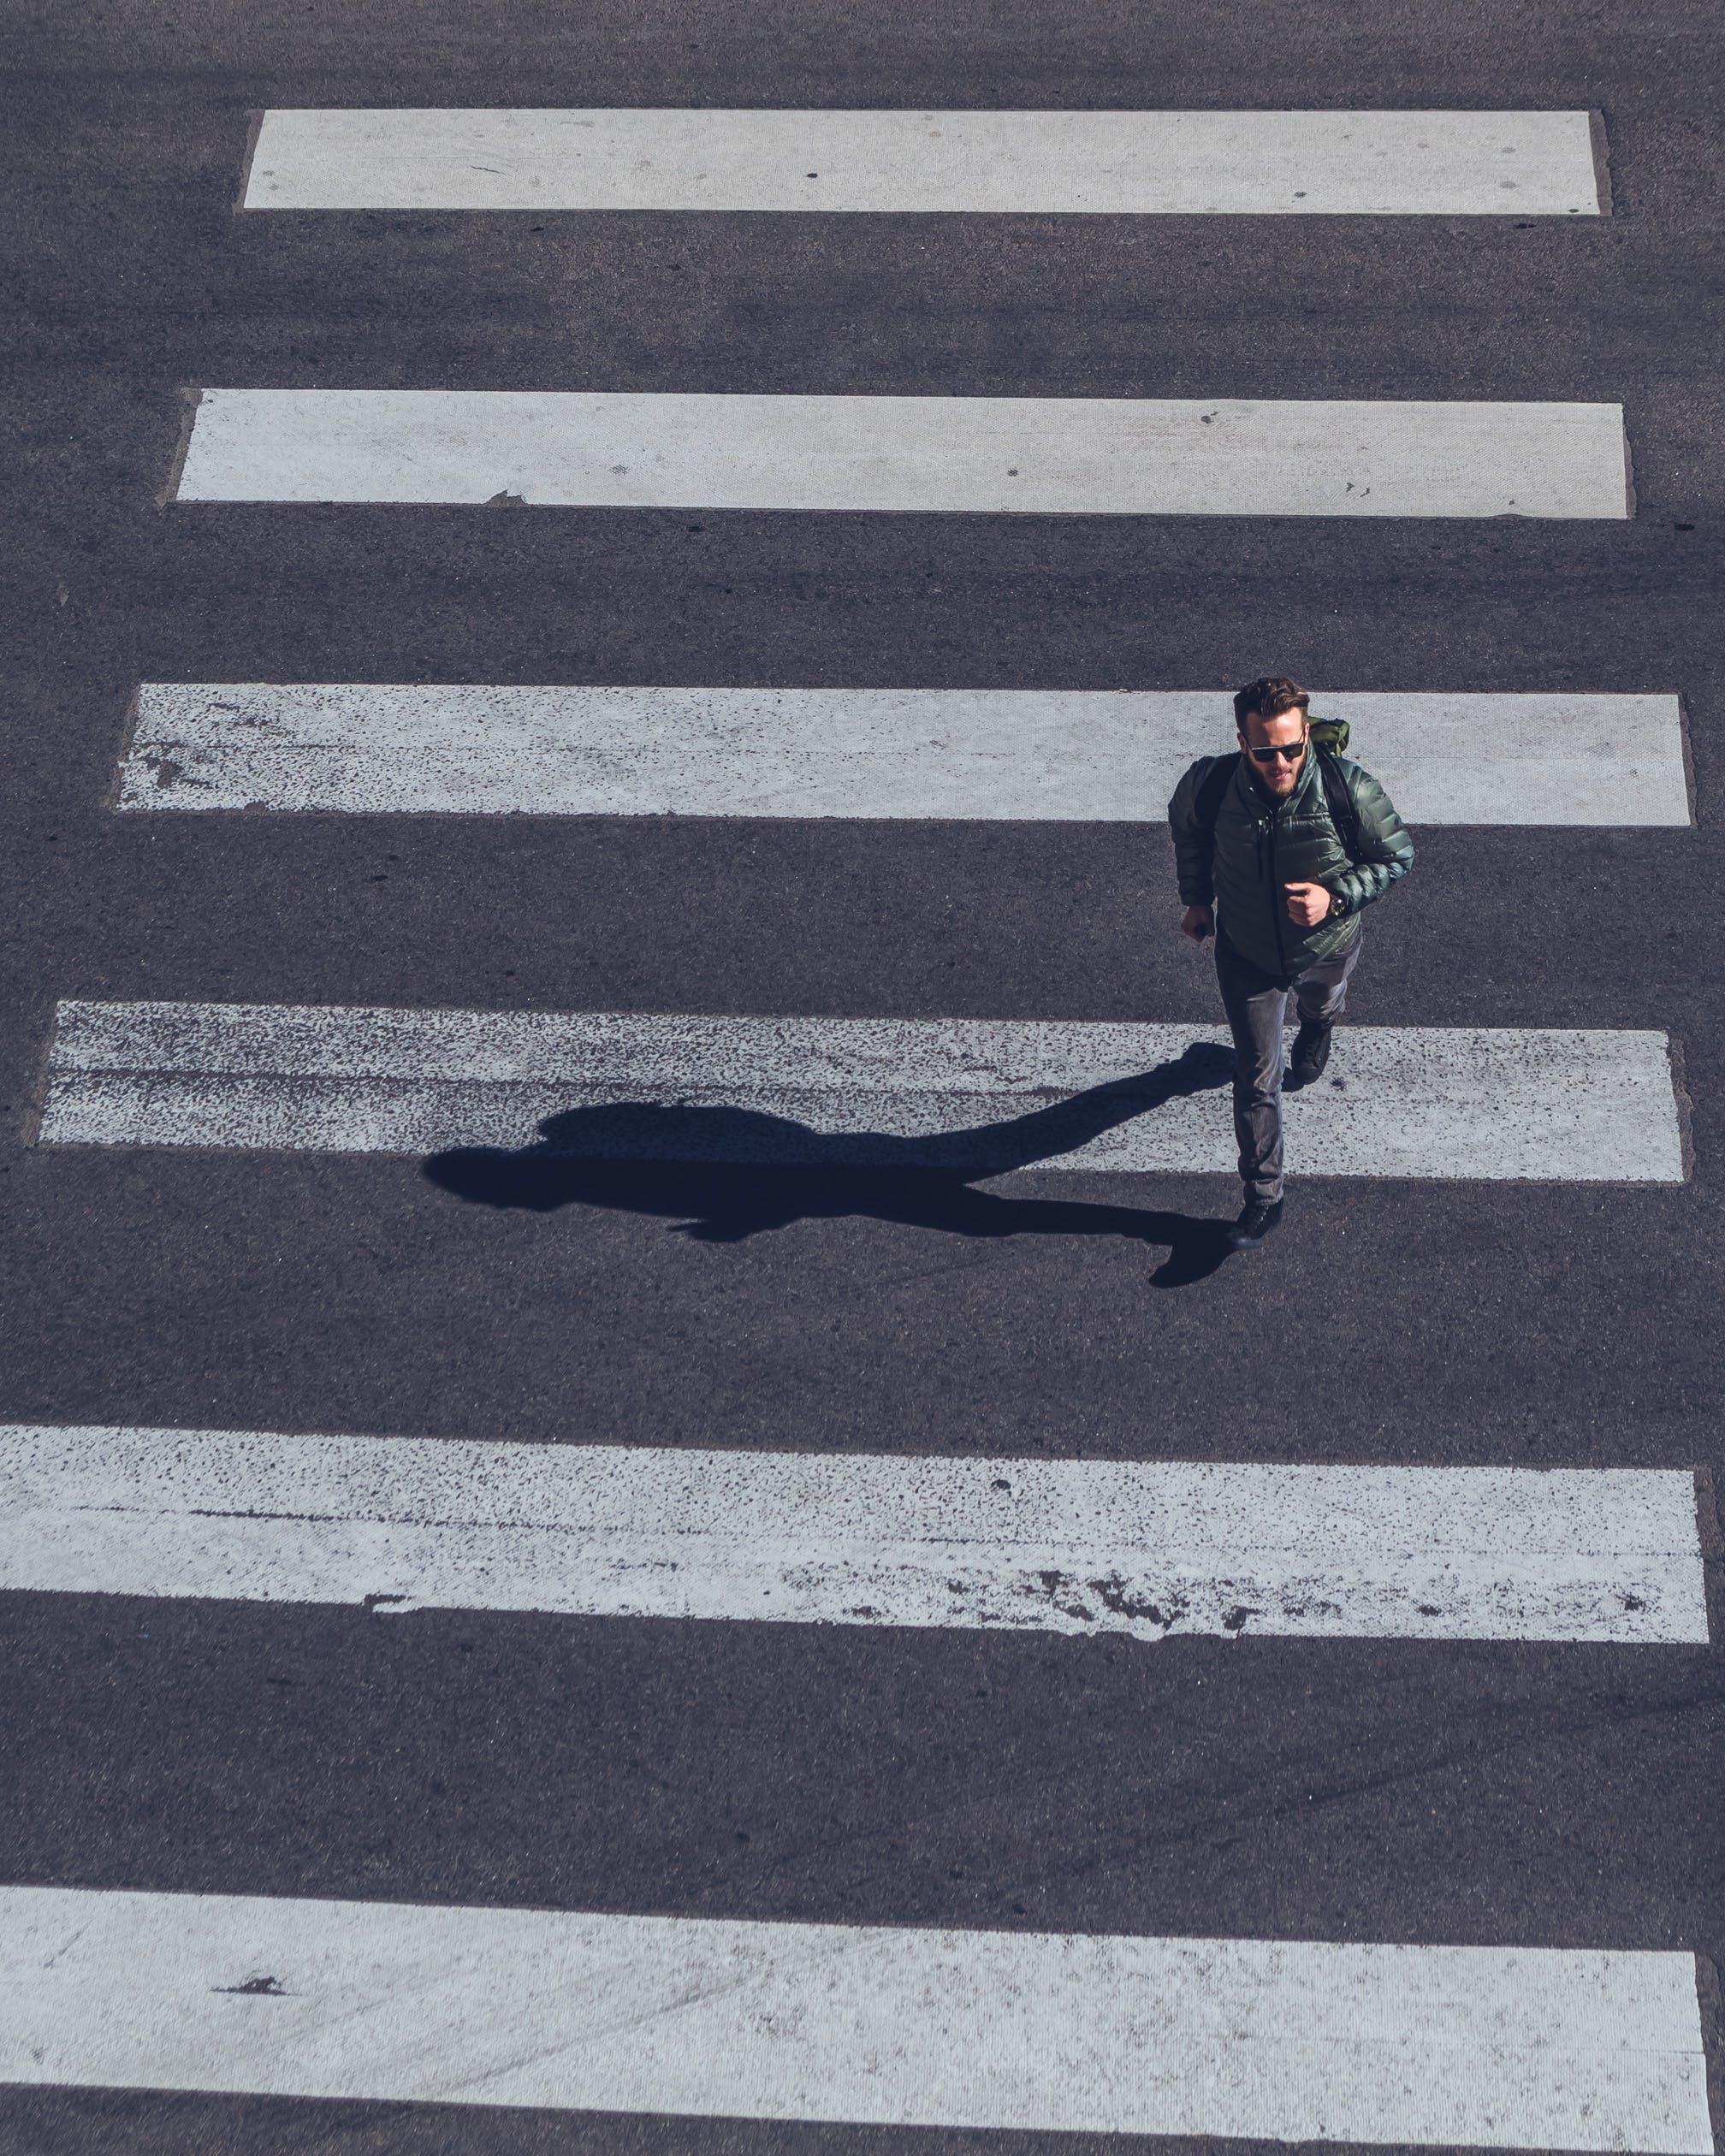 Man Crossing on Pedestrian Lane